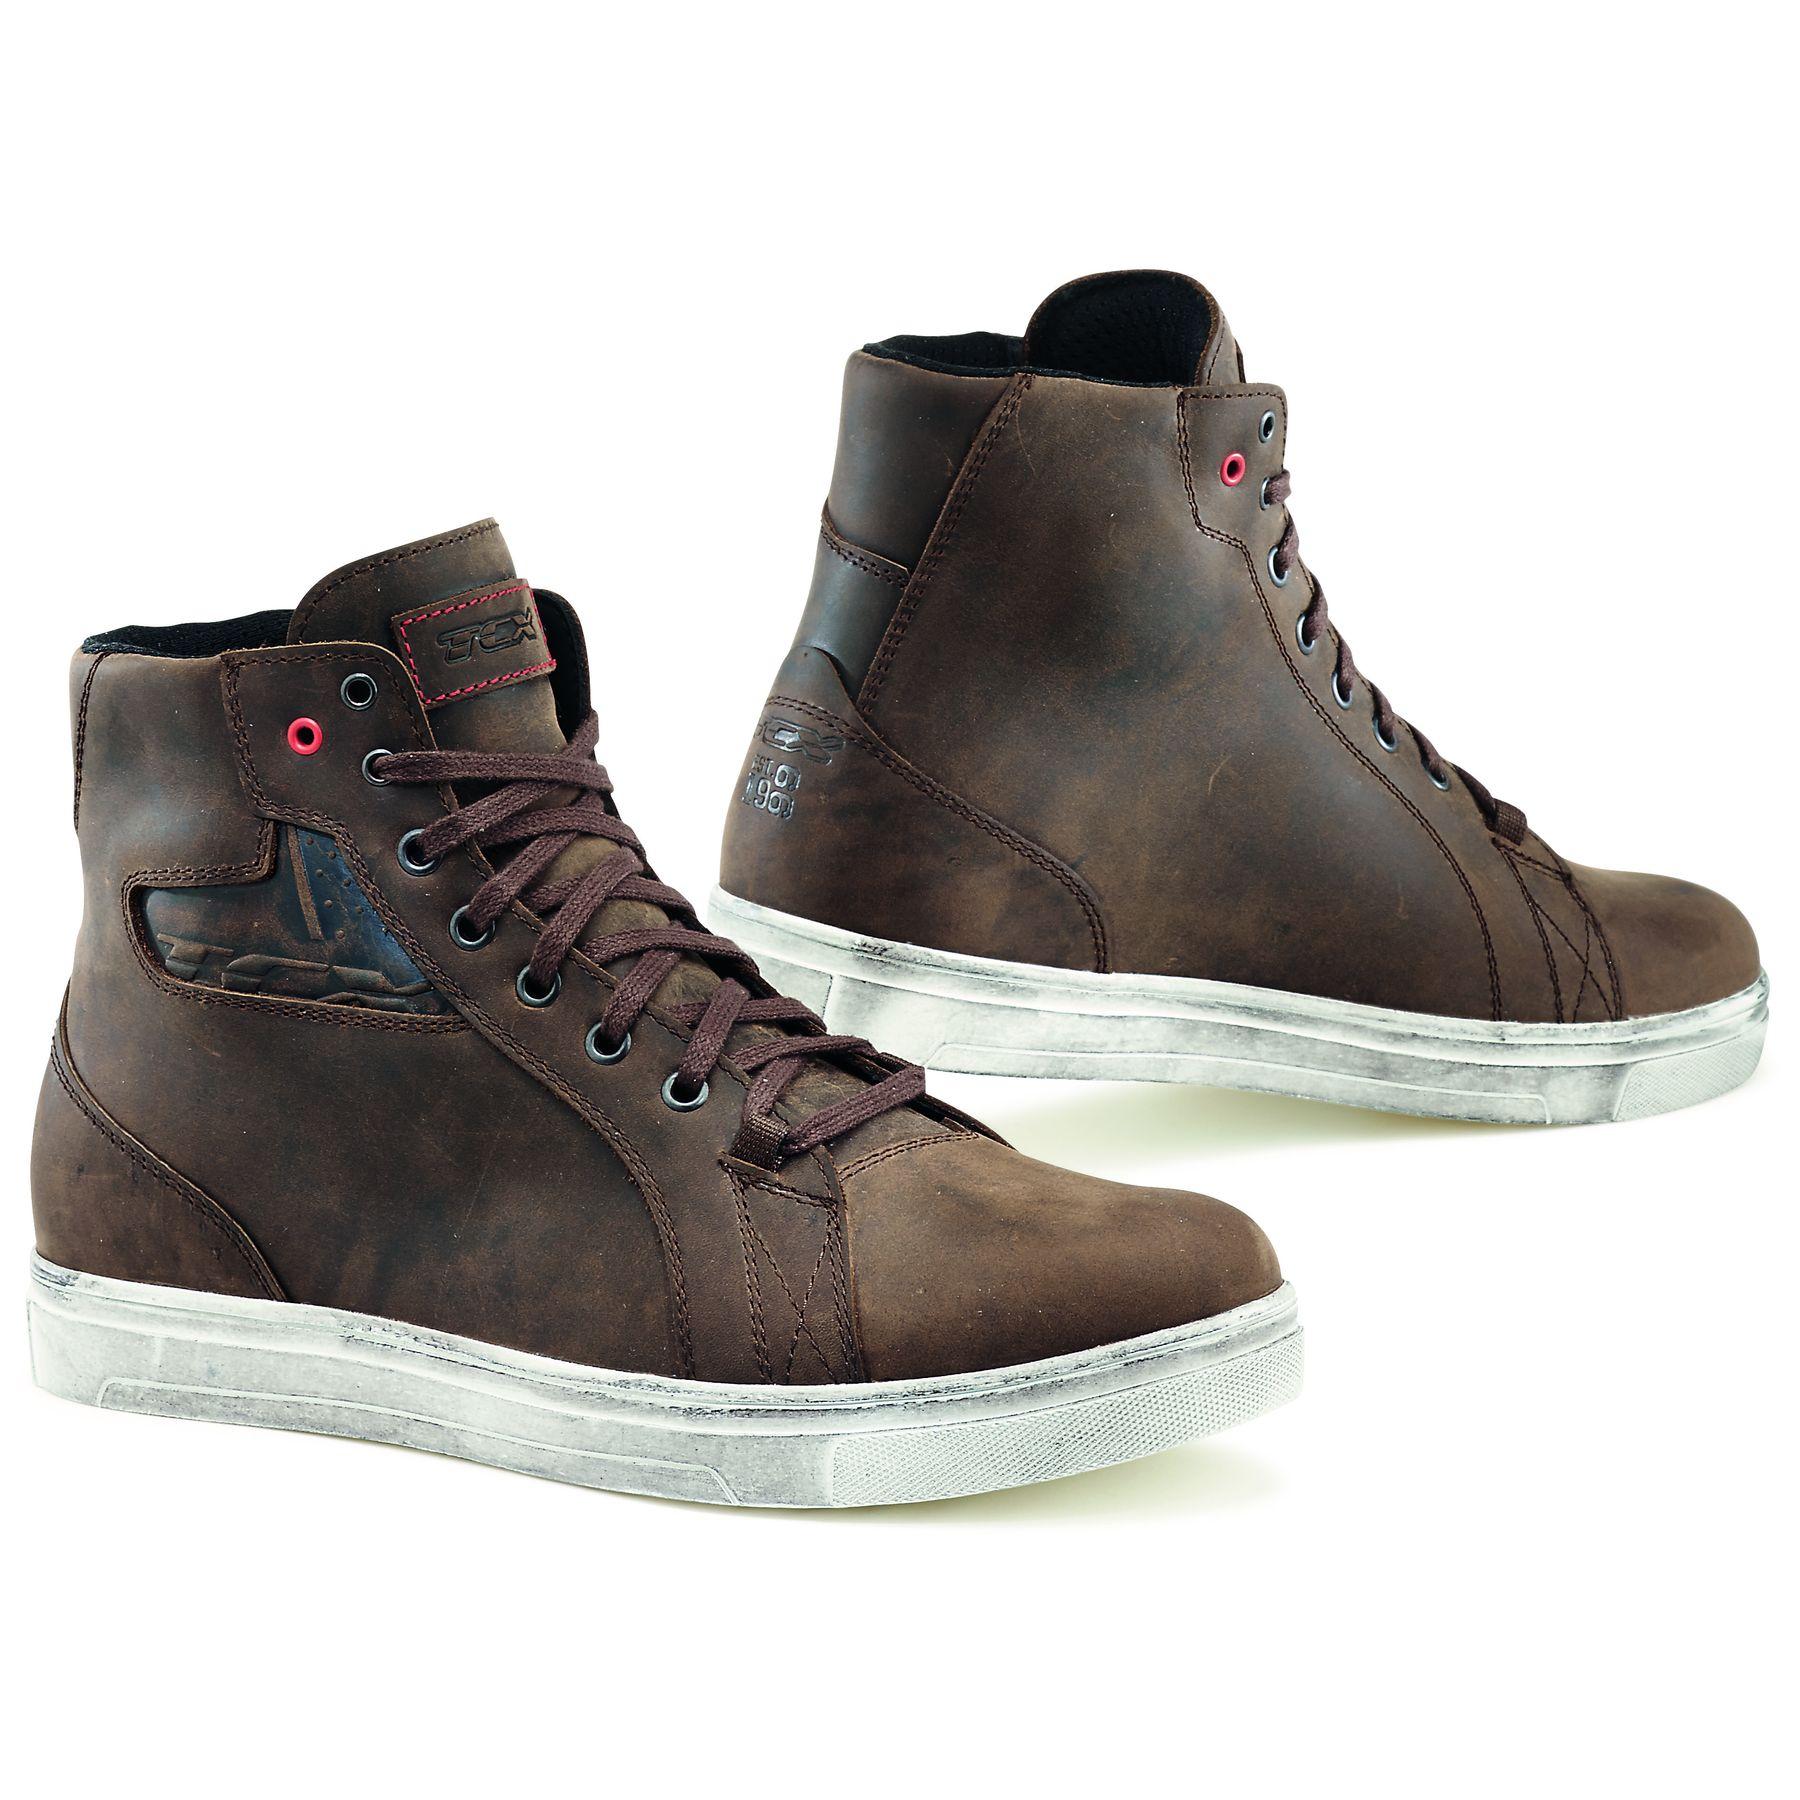 tcx_street_ace_wp_shoes_dakar_brown_1800